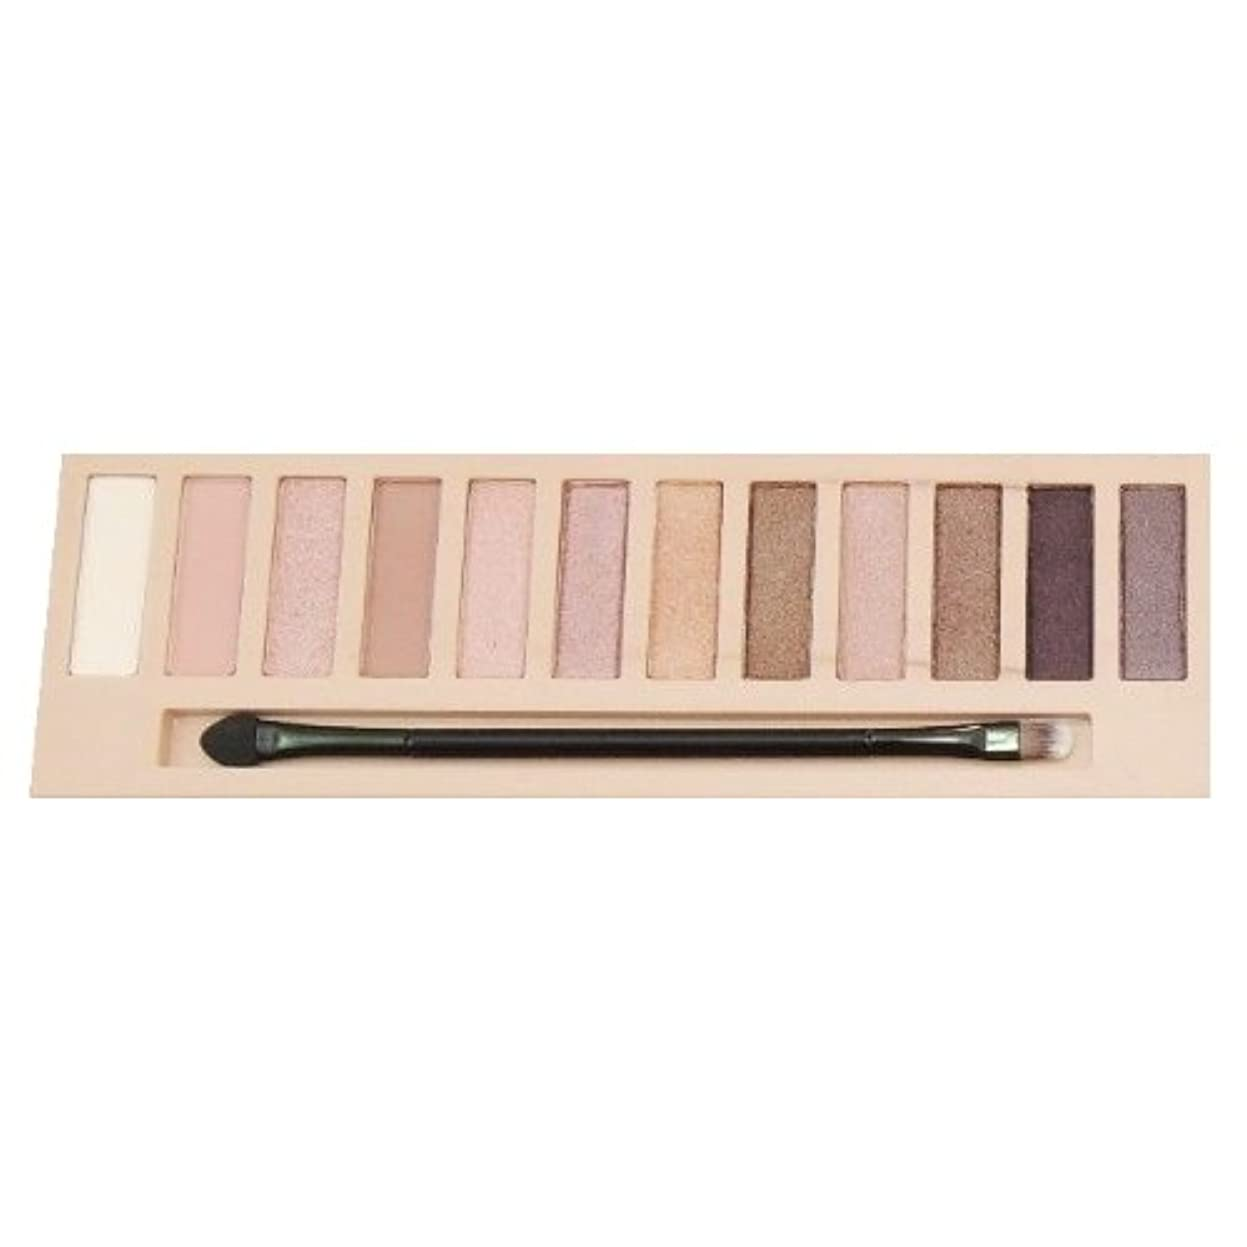 LA GIRL Beauty Brick Eyeshadow Collection - Nudes (並行輸入品)